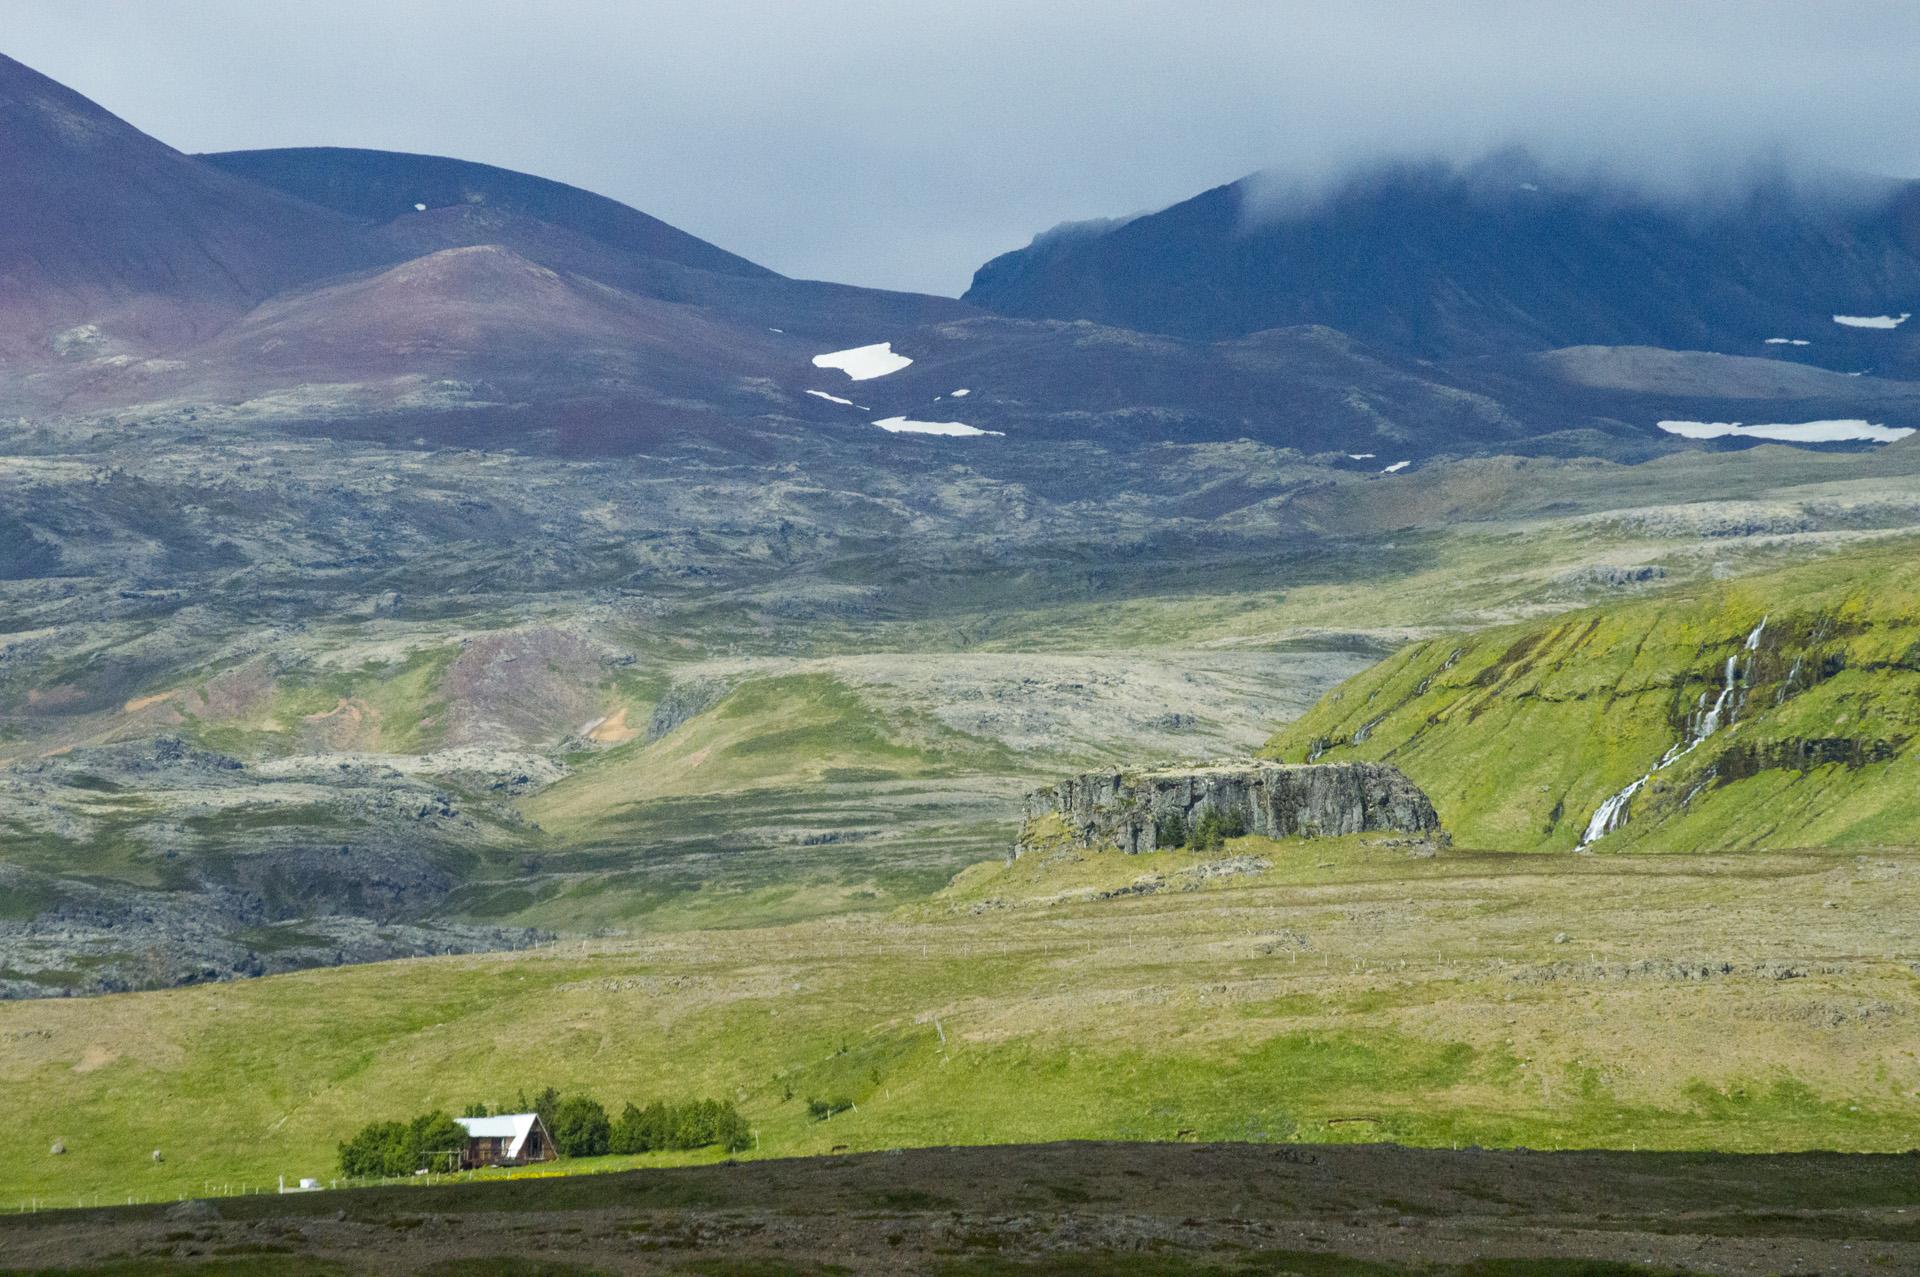 Base of Ljósufjöll (Mountains of the Light), Vesturland region, Iceland